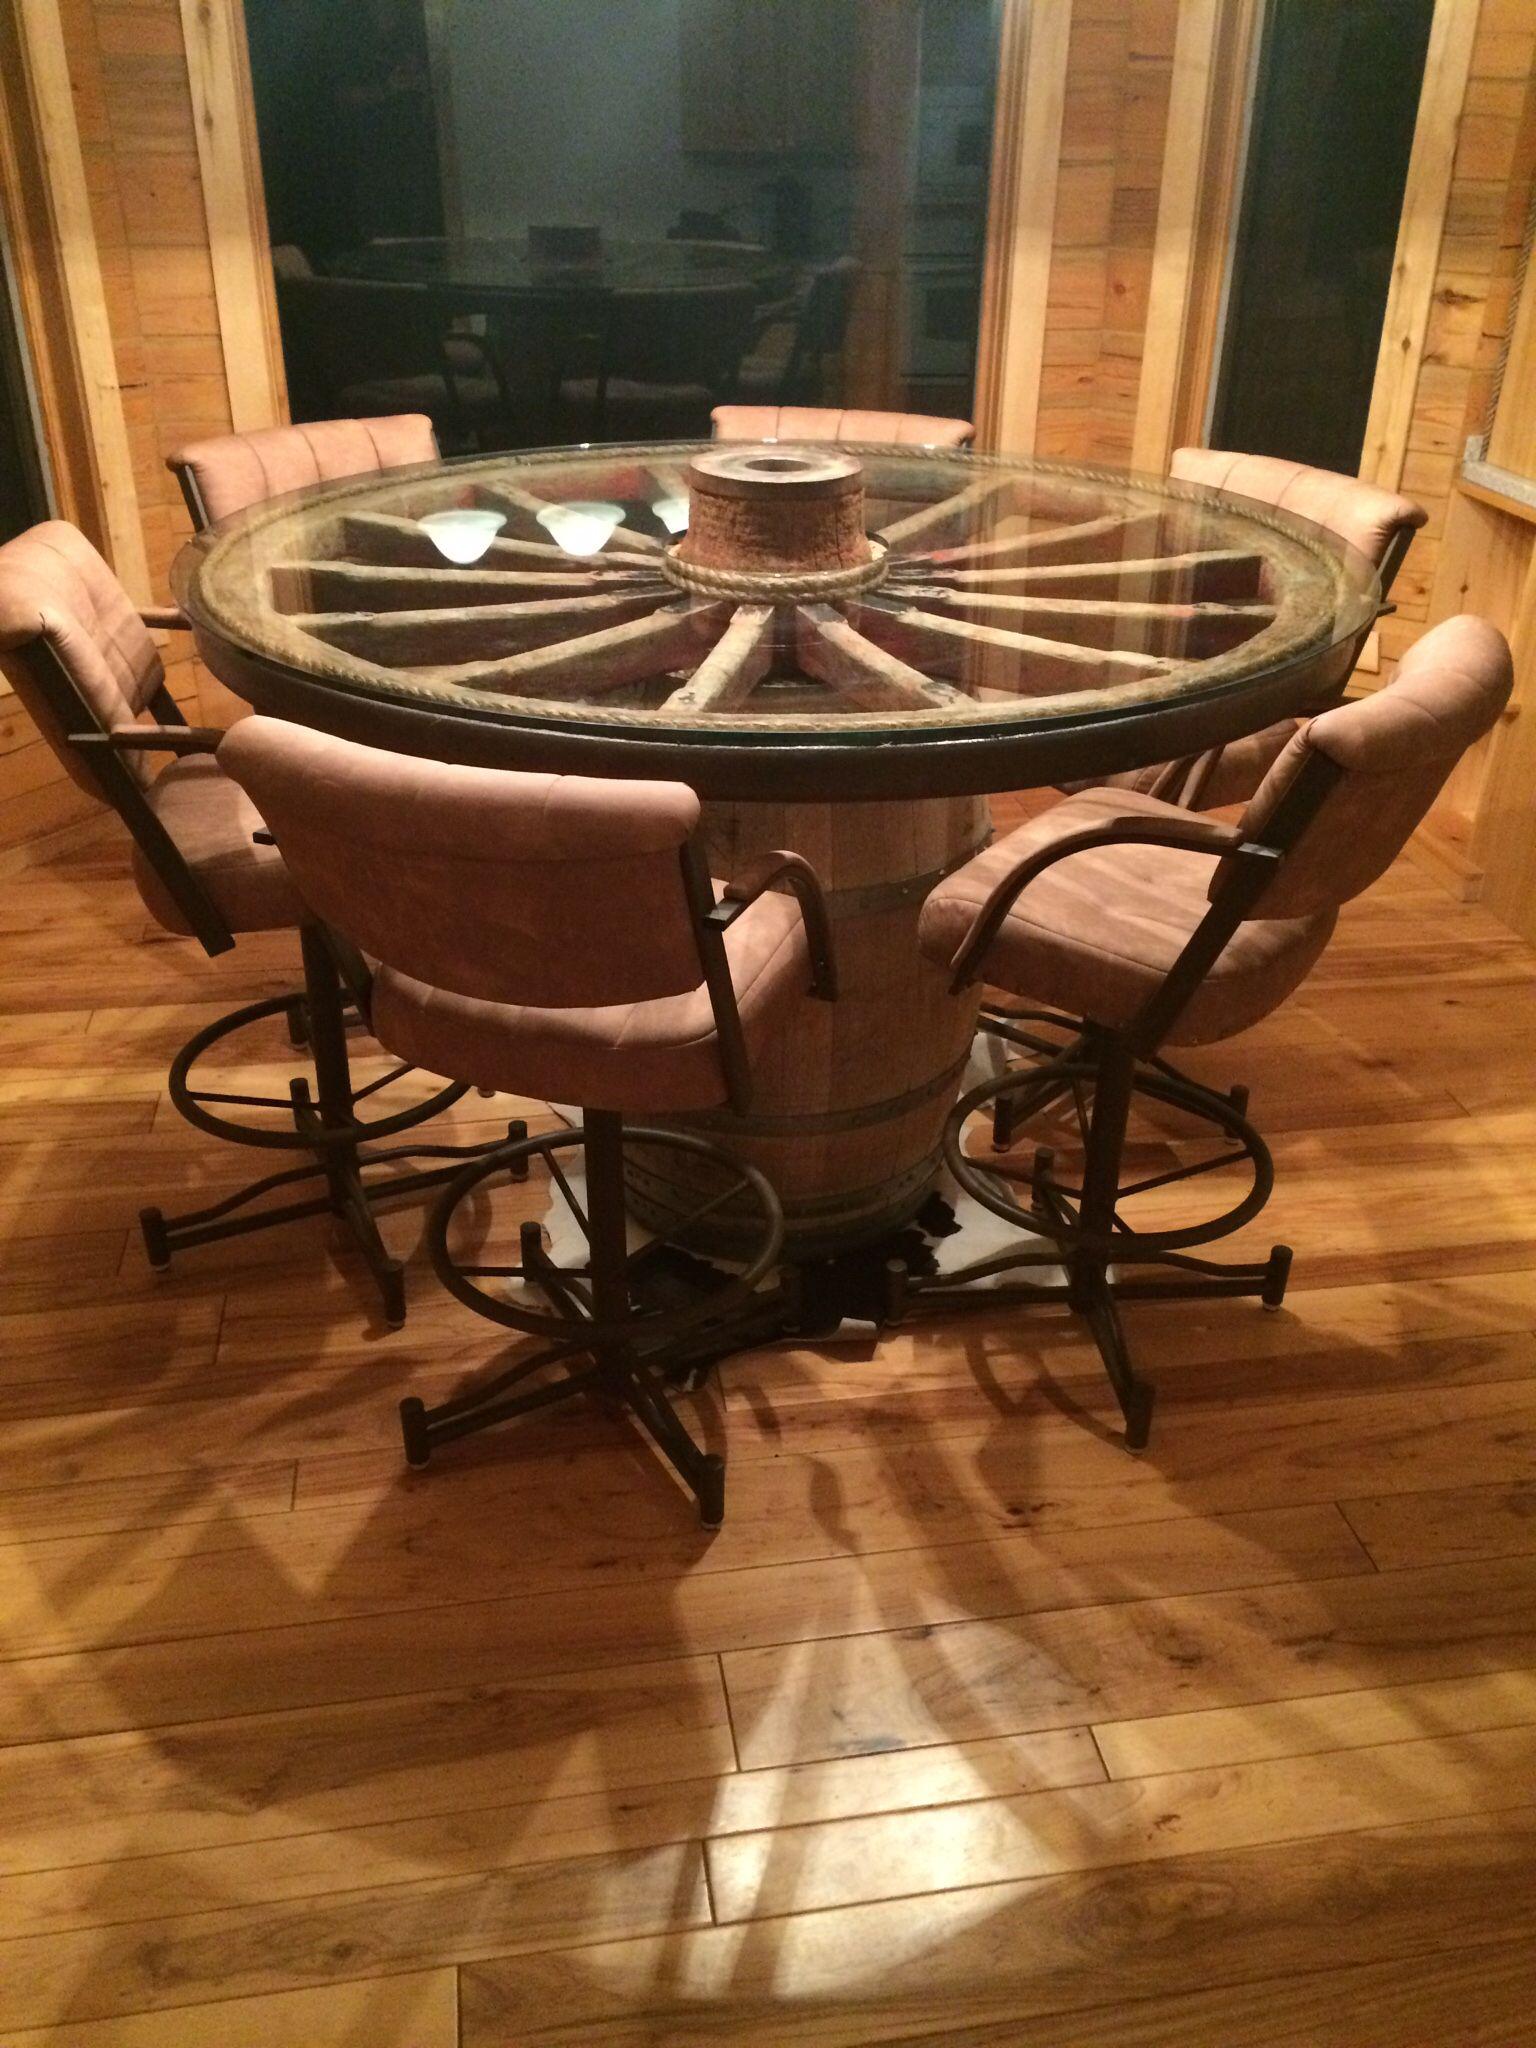 Wagon Wheel Dining Table My House In 2019 Wagon Wheel